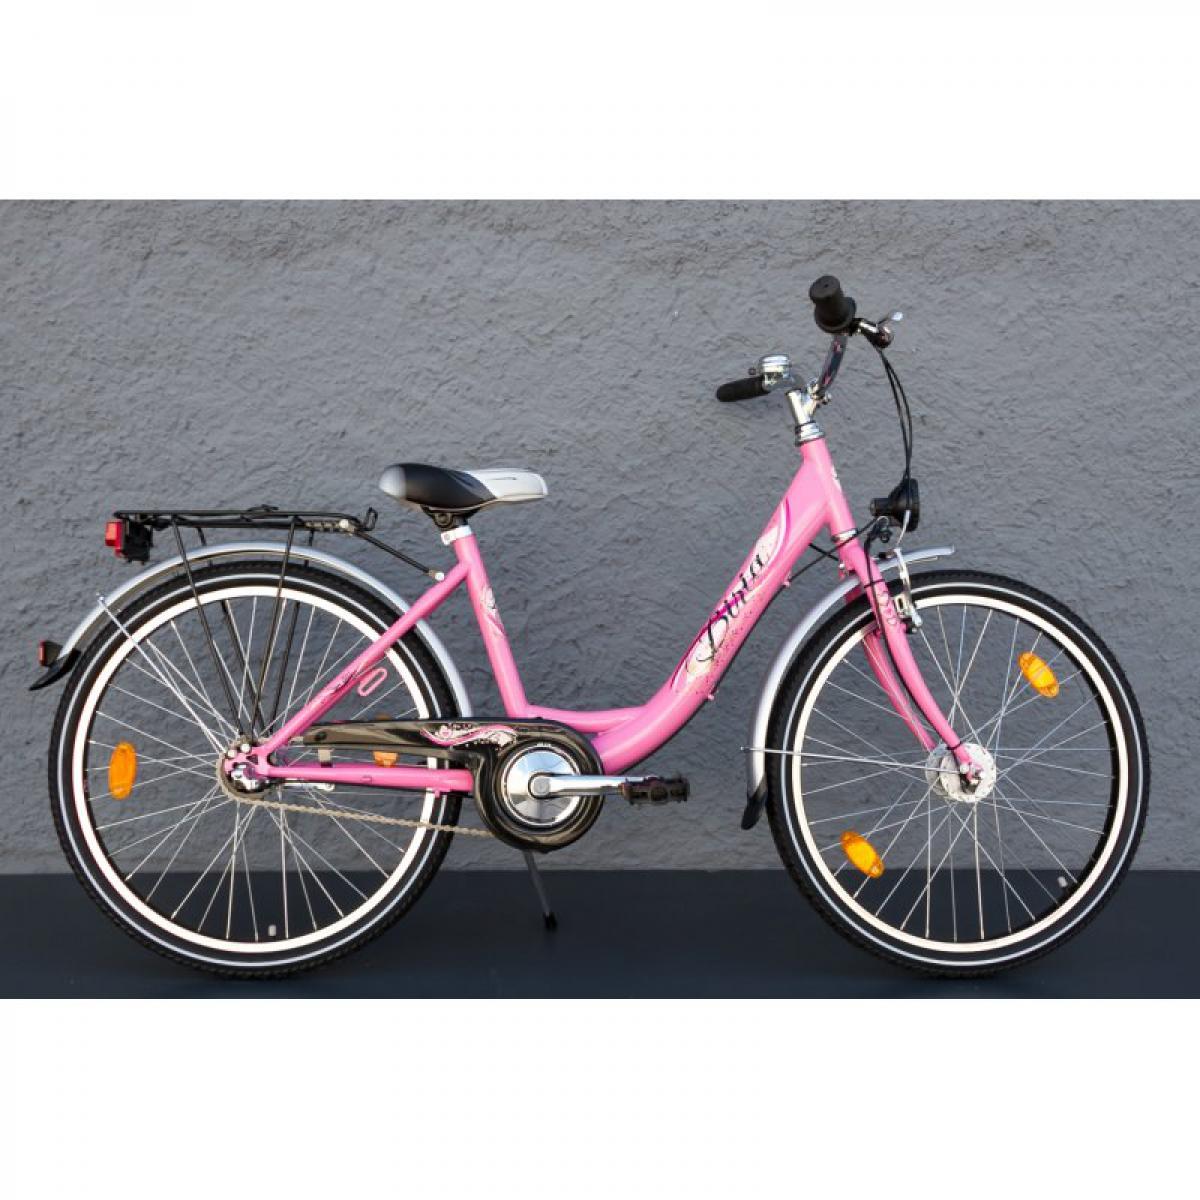 24 zoll mifa biria kinder m dchen fahrrad shimano 3 gang nabendynamo pink stvzo ihr fahrrad. Black Bedroom Furniture Sets. Home Design Ideas